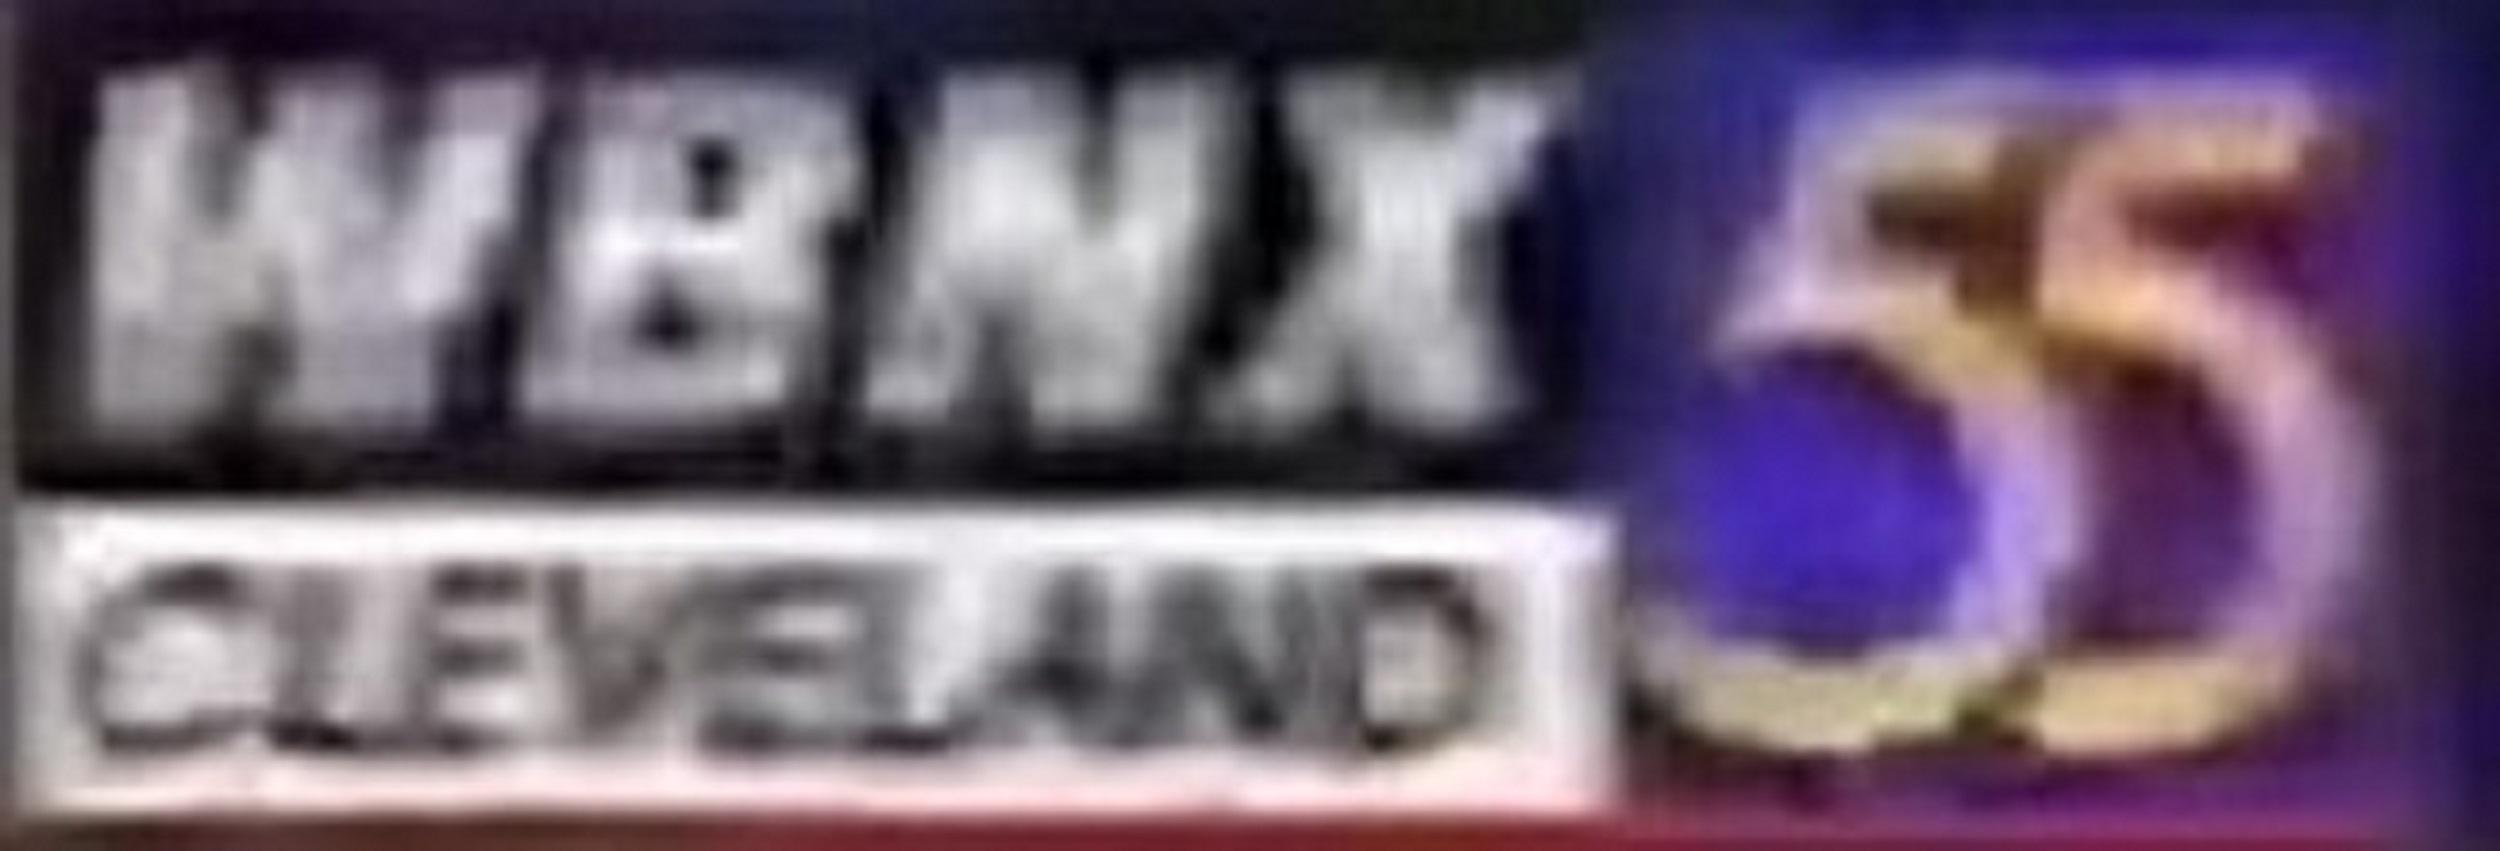 File:WBNX Logo 1995 a.jpg